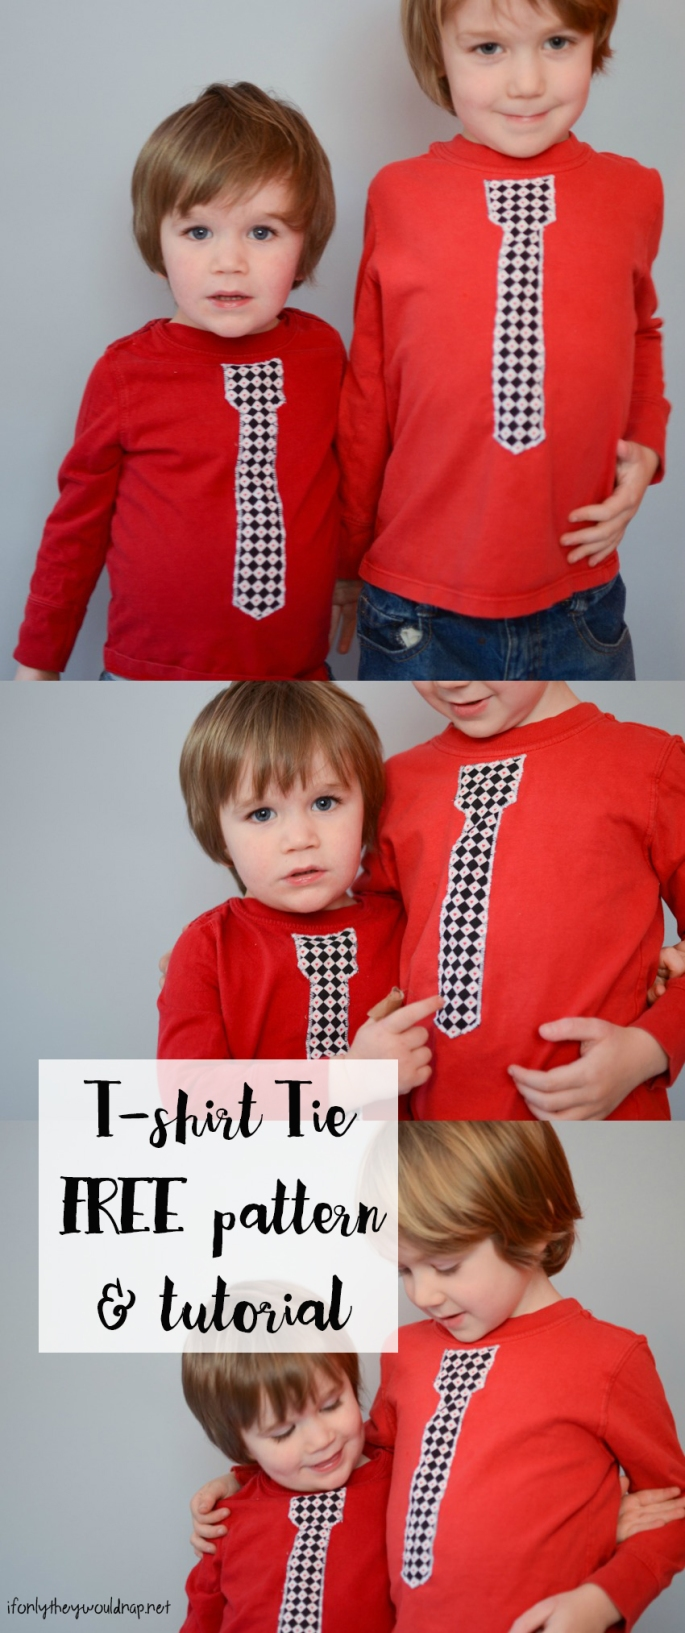 Tshirt Tie FREE pattern and tutorial